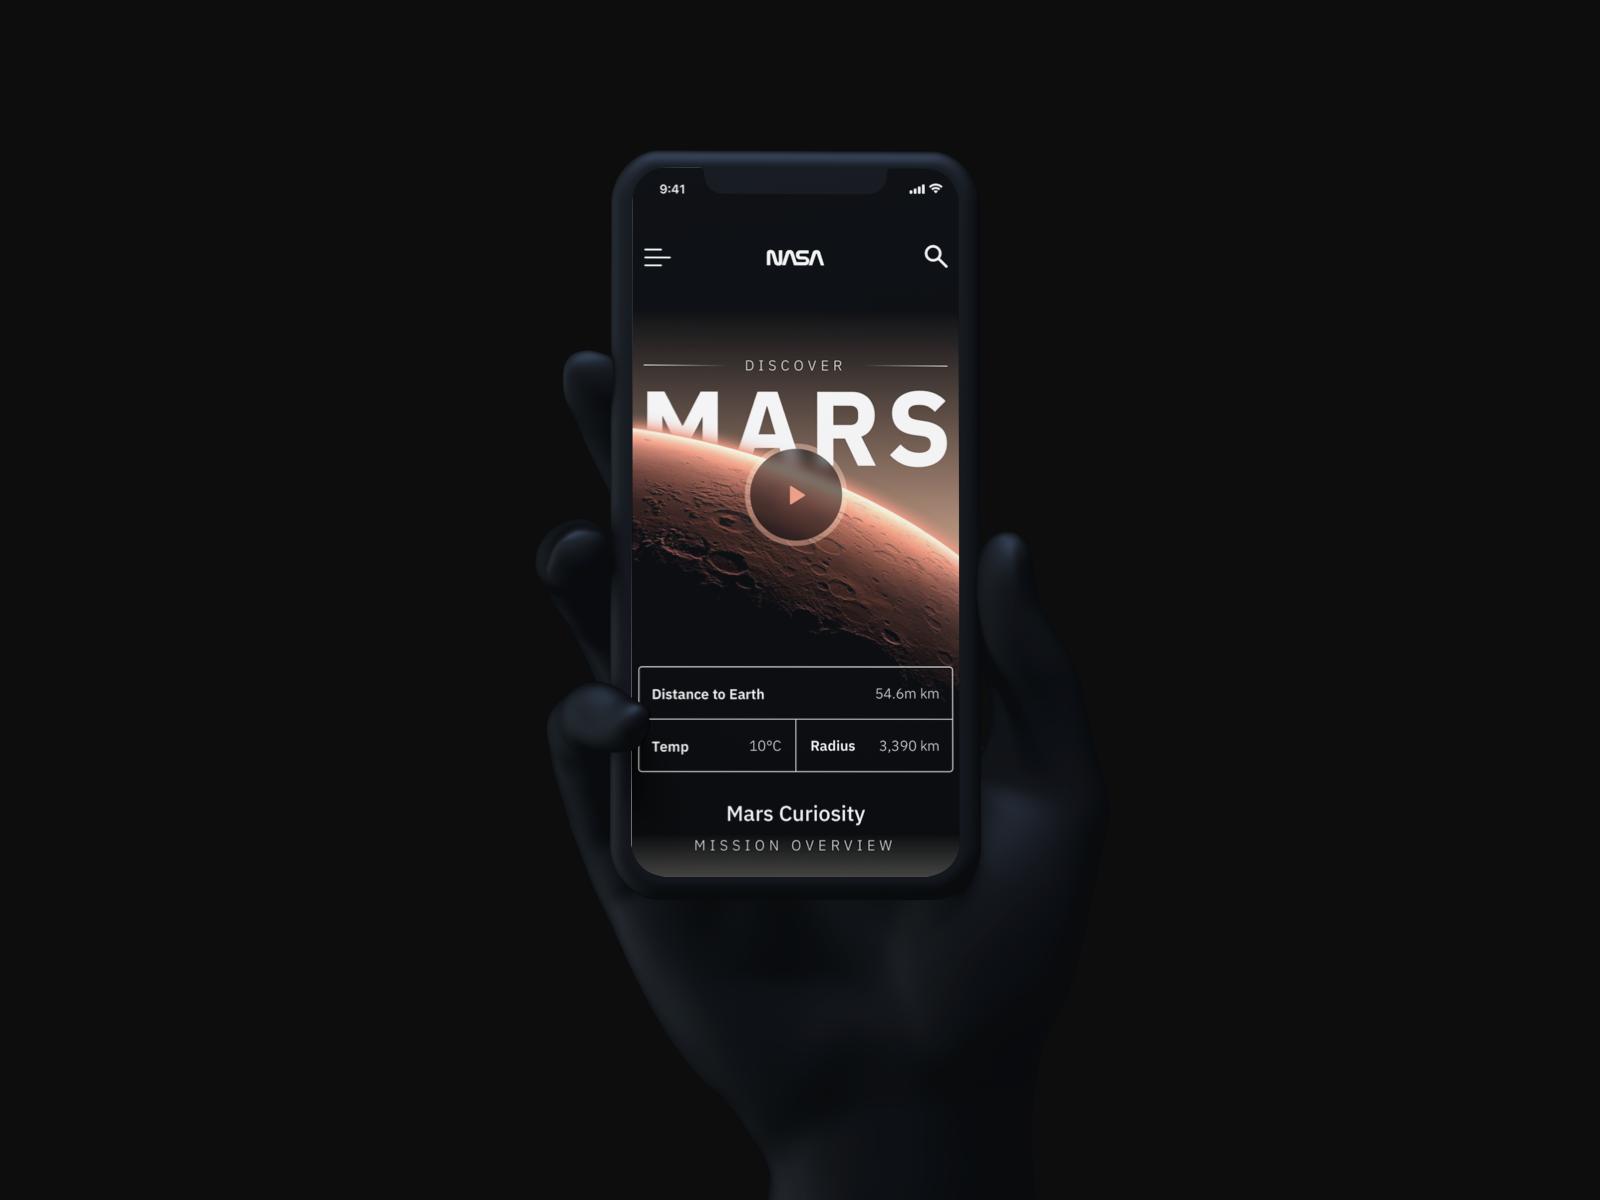 Mars 4x